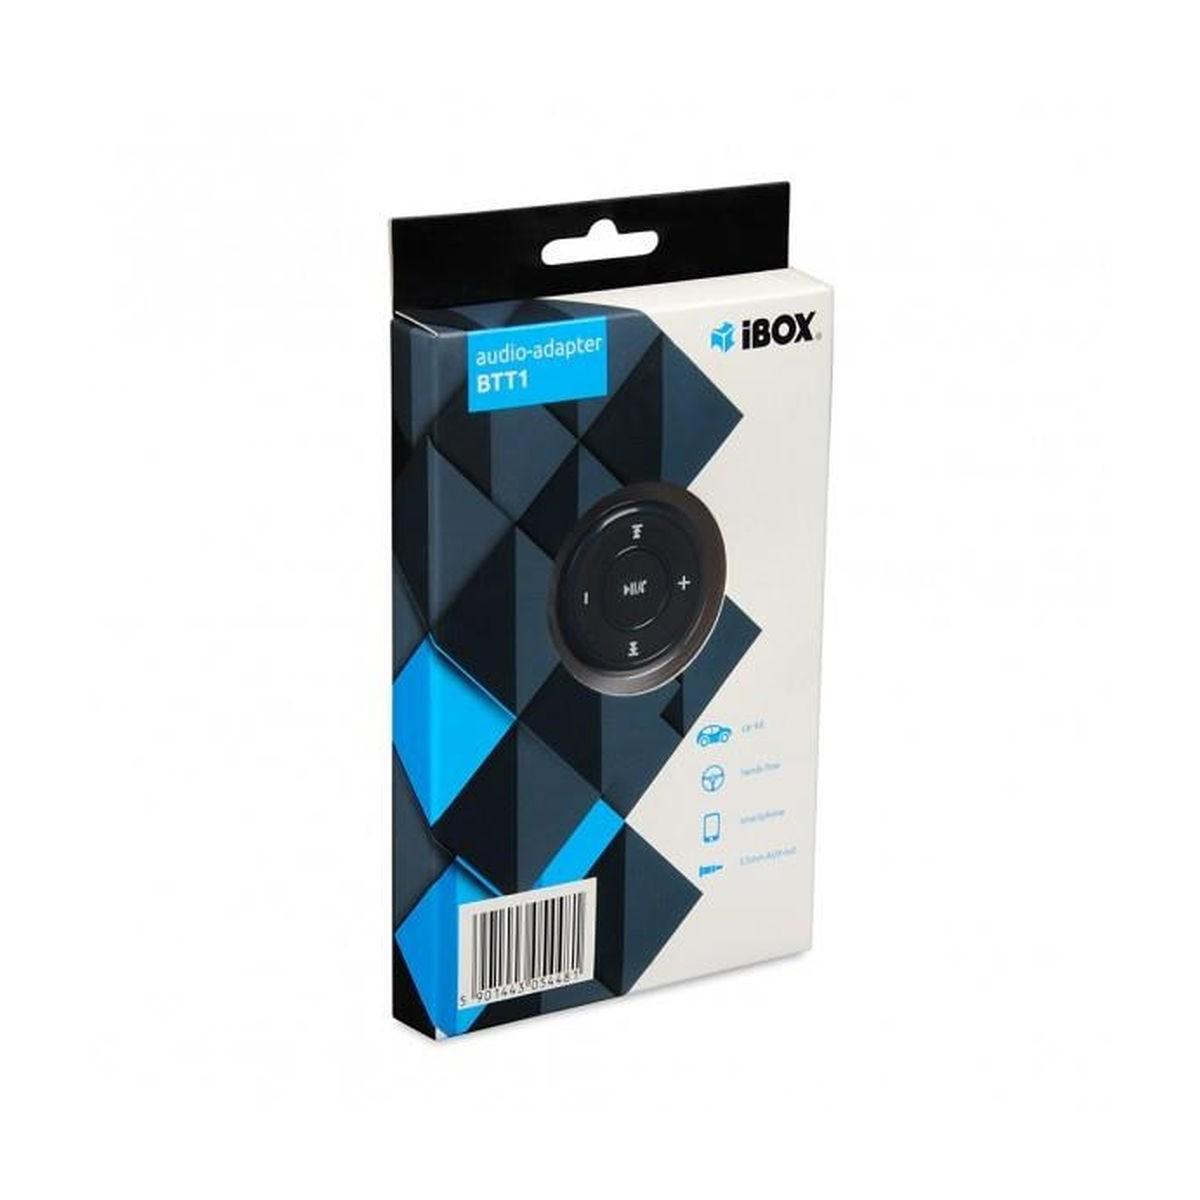 FUJITSU TX200 S7 2.20 E5 8GB 2x450 SAS 2xPSU RAID